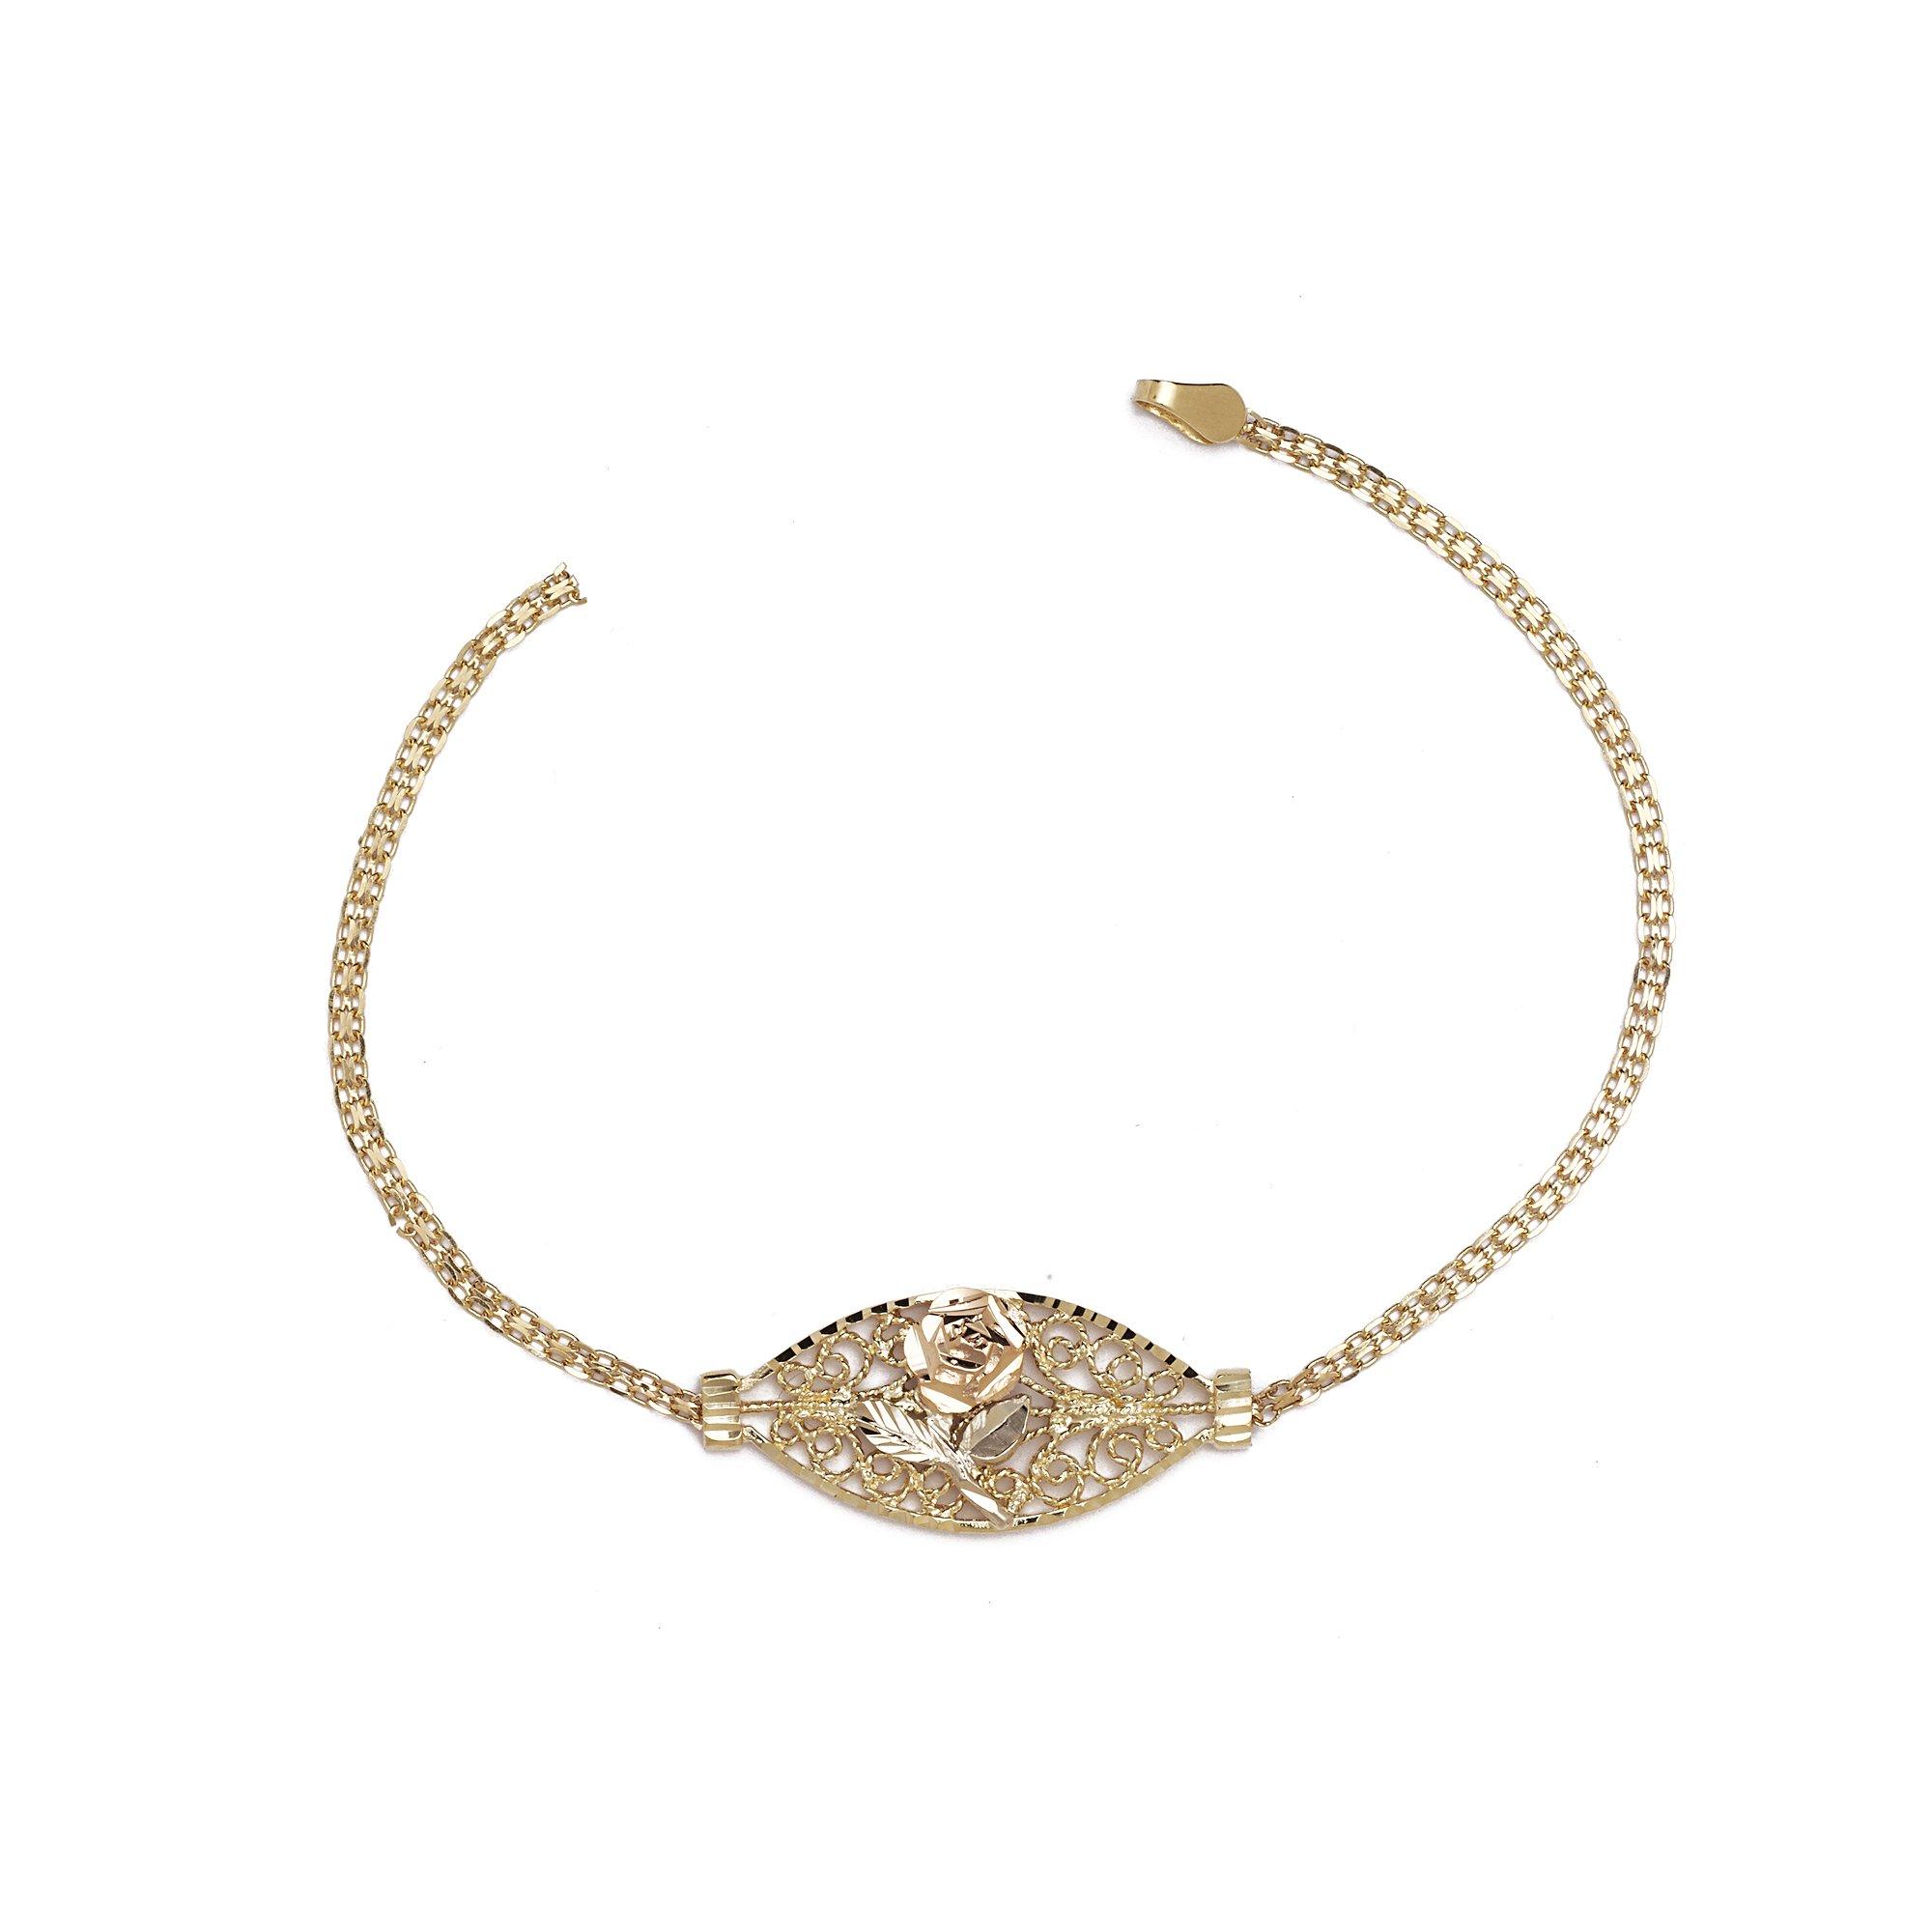 Flower and Rose Fancy Bracelet - 10k Yellow Gold - 7 Inch